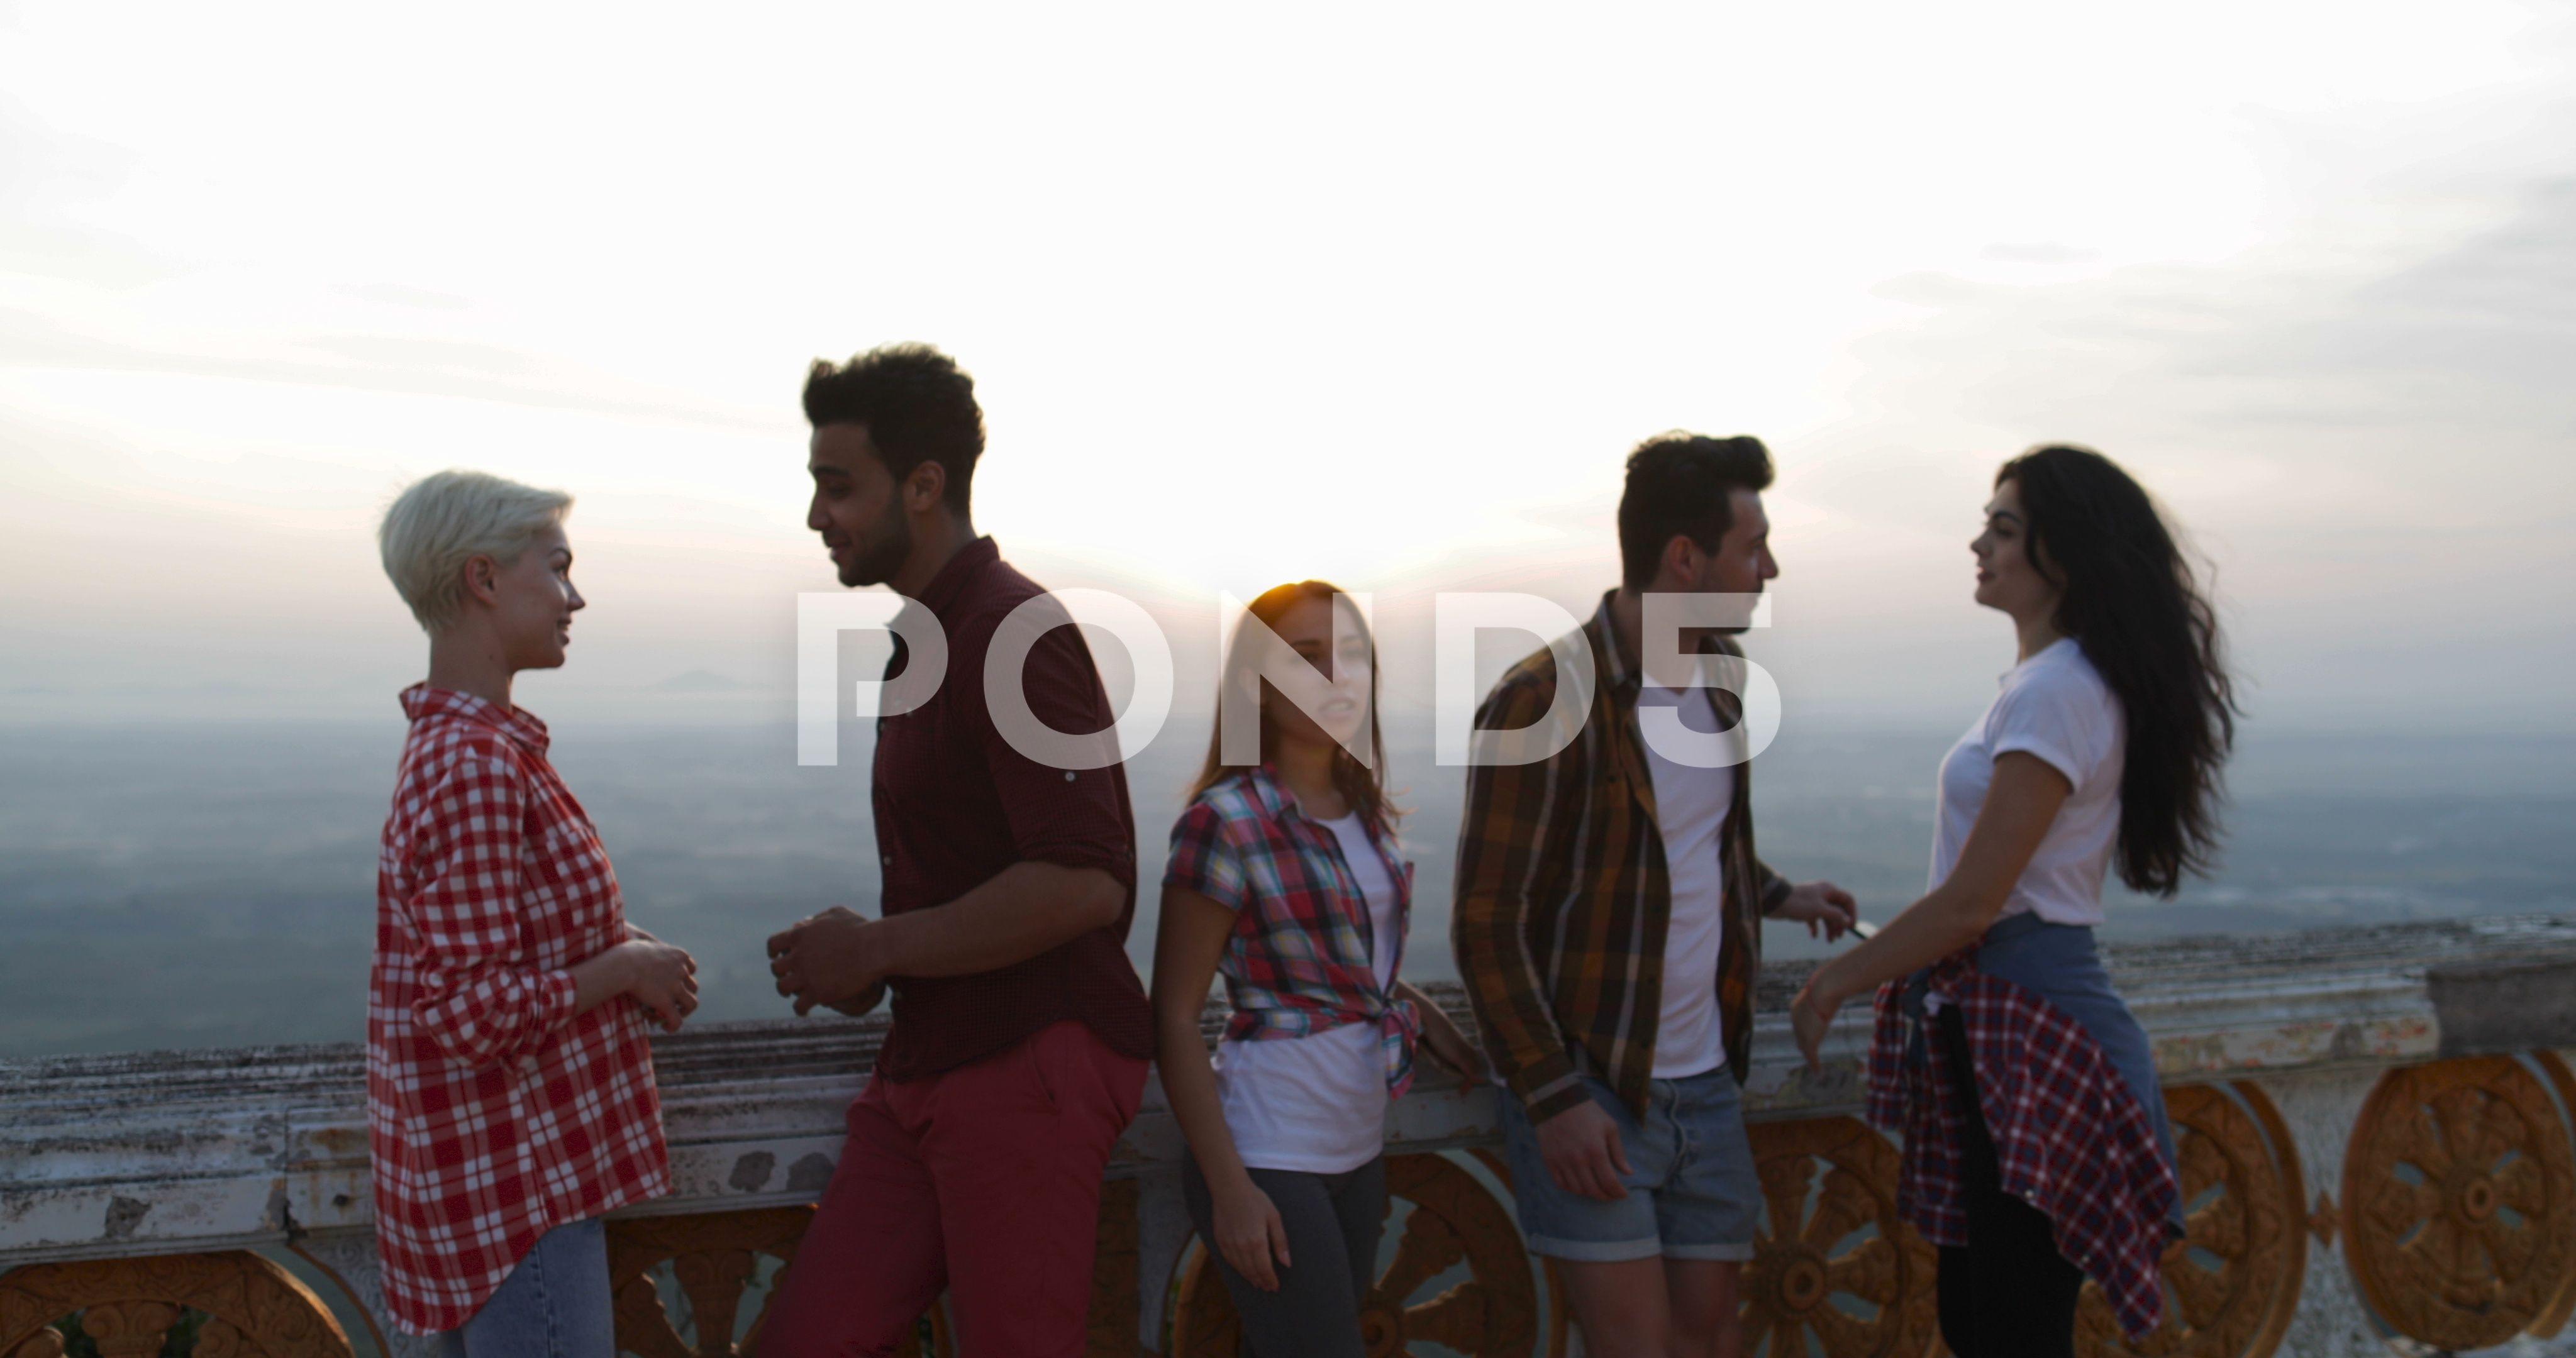 People On Mountain Top Talking At Sunrise Smiling Looking In Camera Friends Stock Footage TalkingSunriseTopPeople